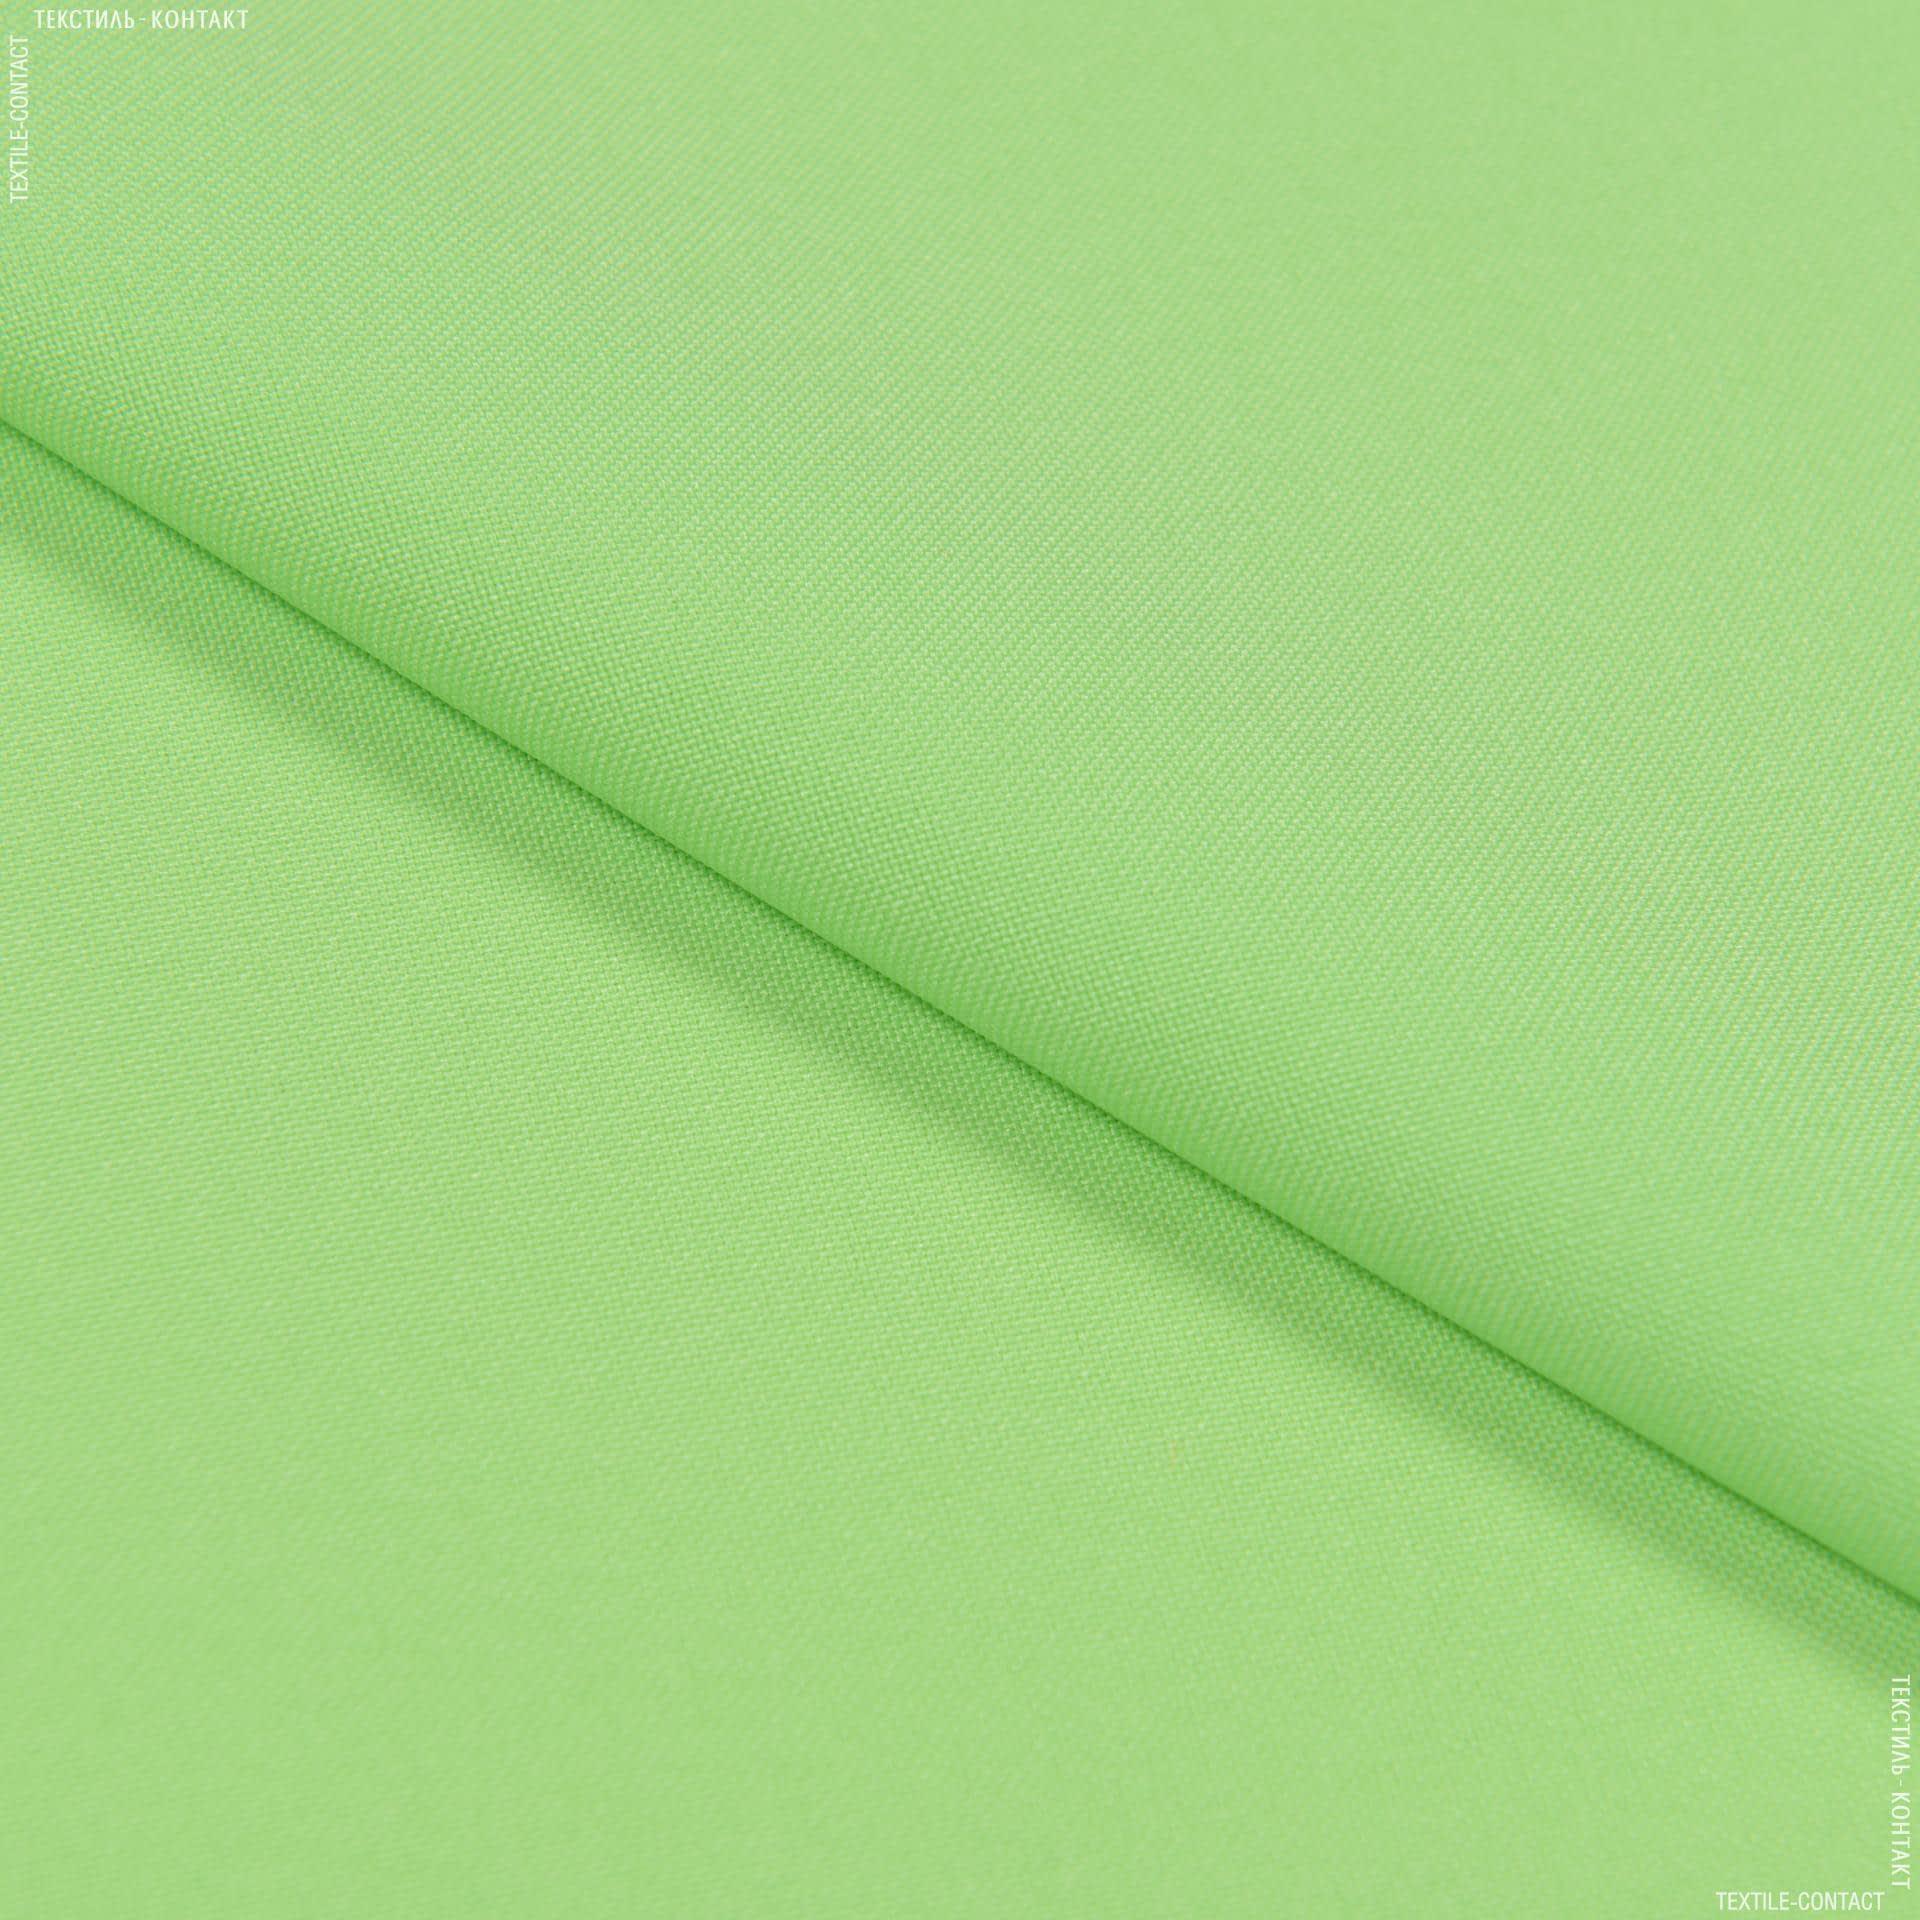 Тканини для спецодягу - Габардин світло-салатовий